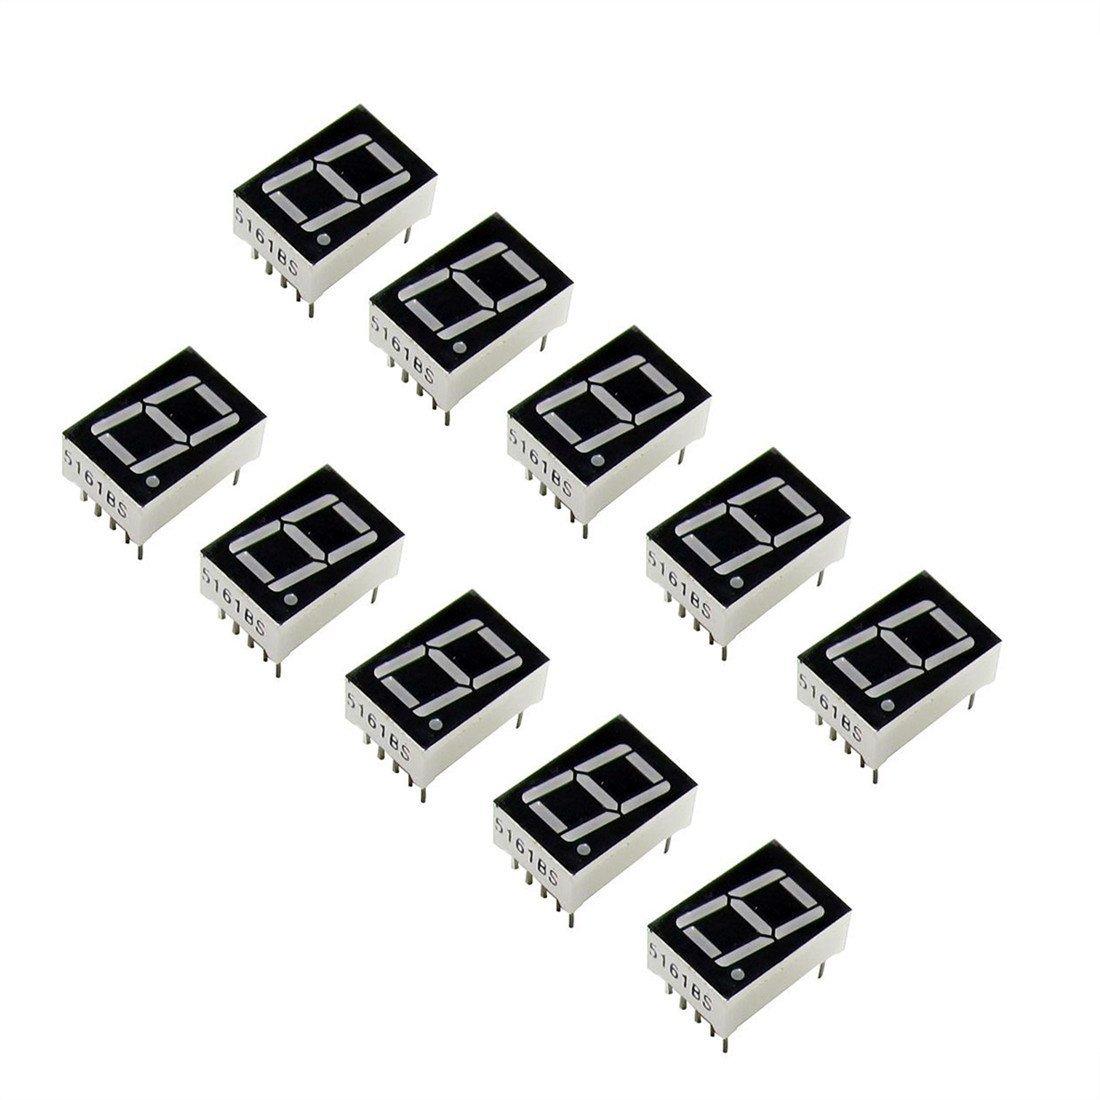 oiyagai 10/Pcs Gemeinsame Kathode 10-poligen 1/Bit 7/Segment 1,4/cm Rot LED Display Digital Tube Common Cathode